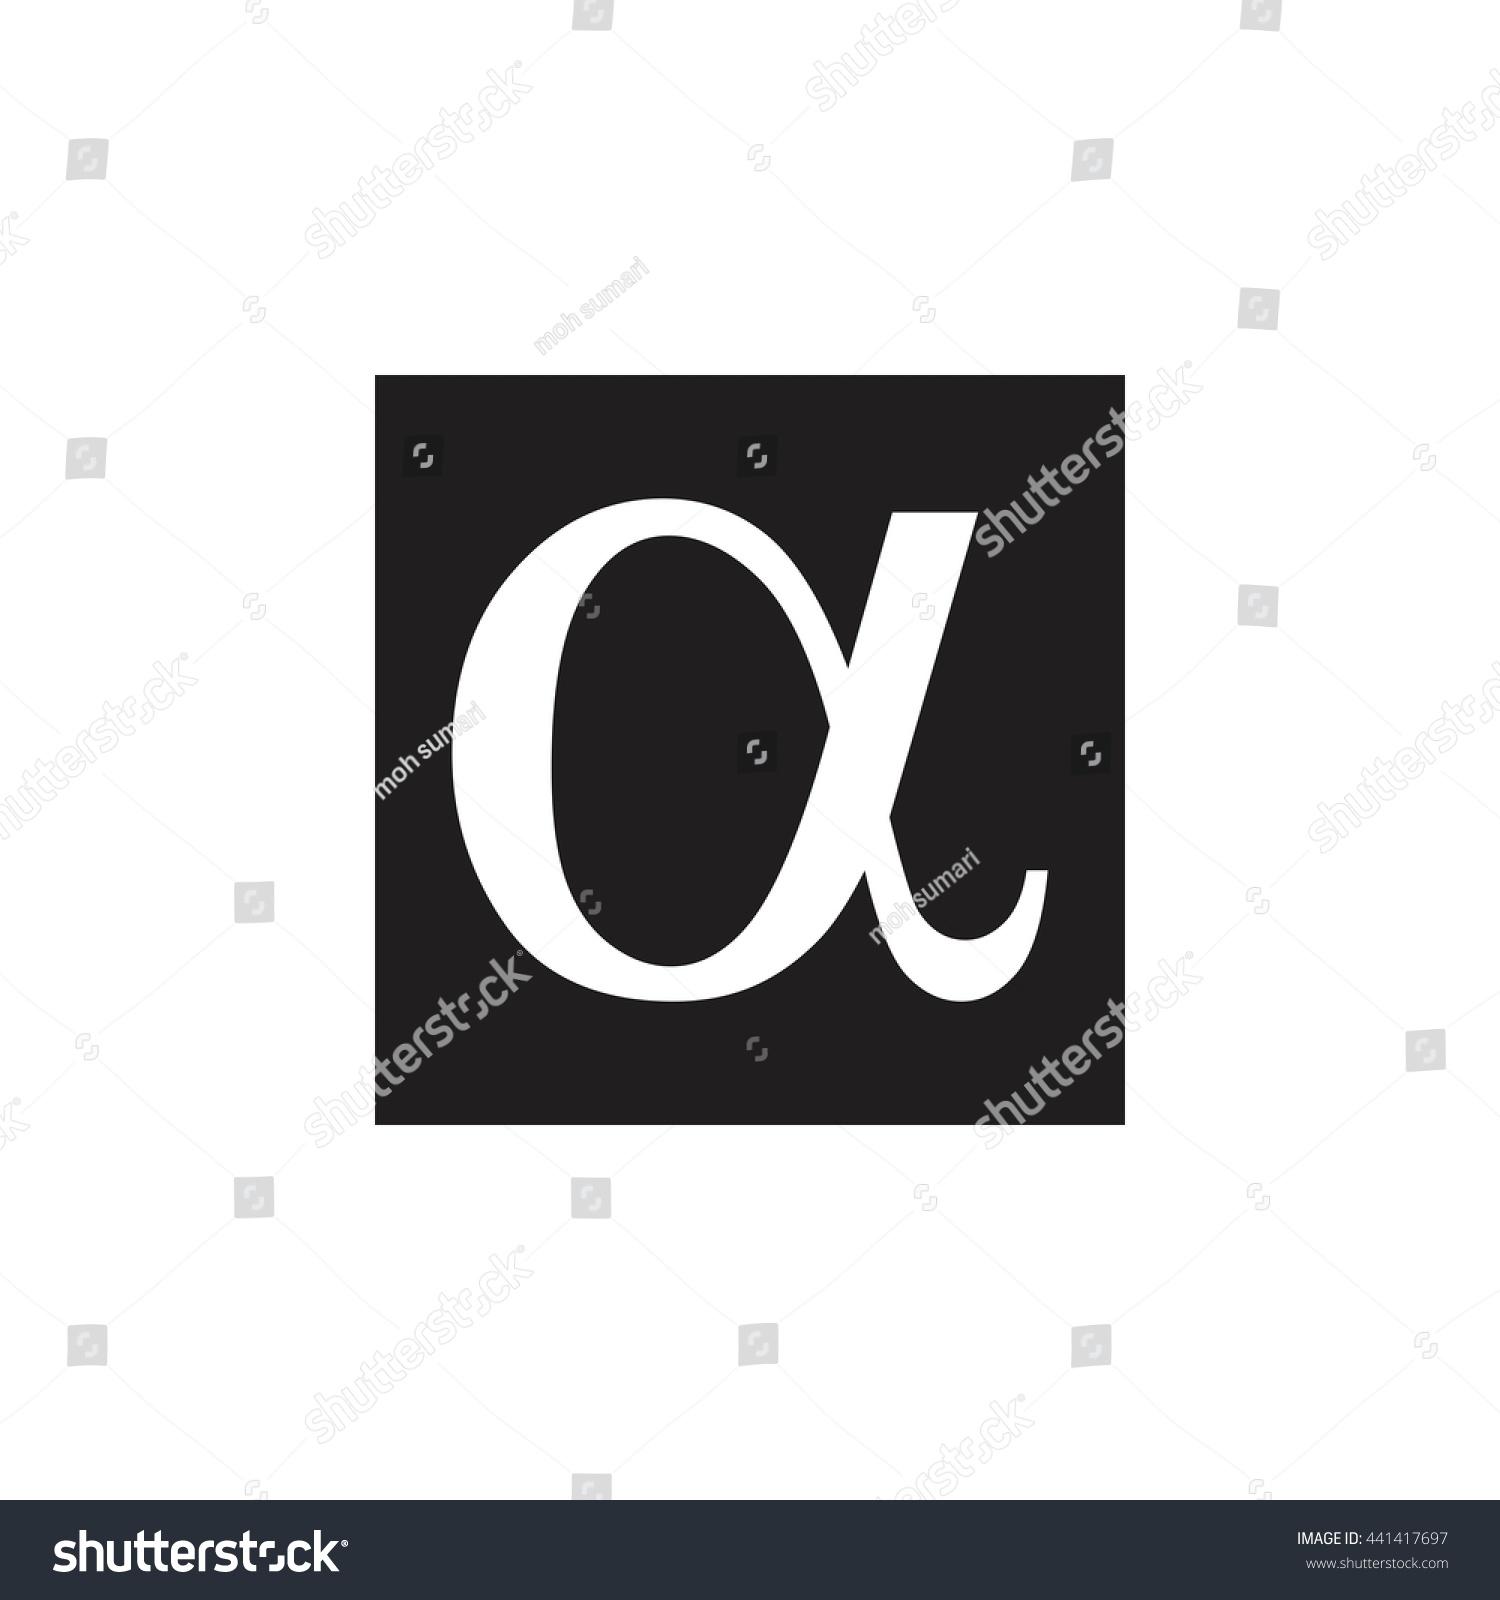 Greek alphabet alpha letter logo stock vector 441417697 shutterstock the greek alphabet alpha letter logo biocorpaavc Image collections